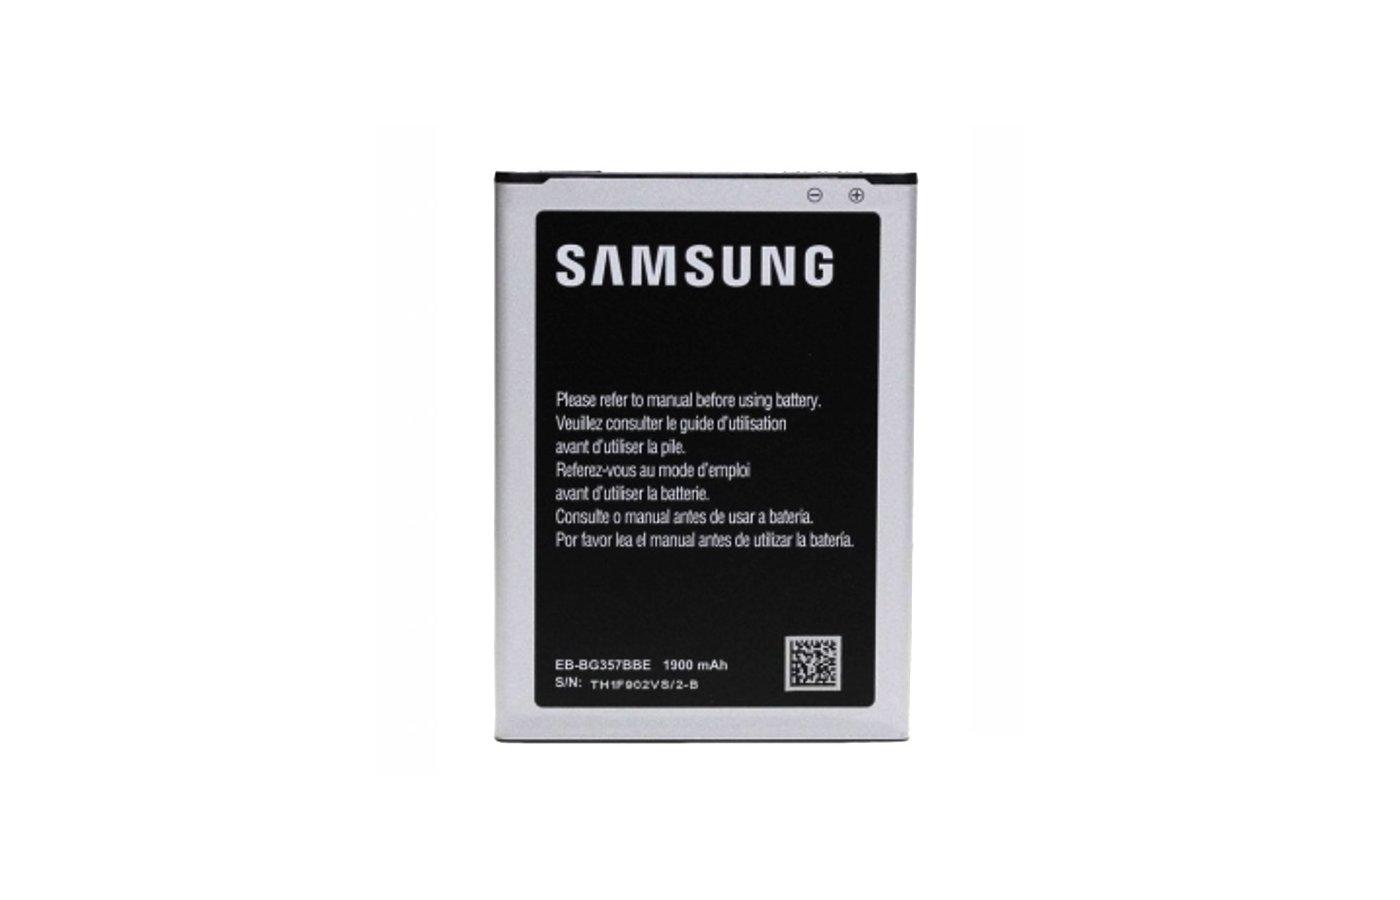 Аккумулятор Partner для Samsung EB-BG357BBE 1900mAh (ПР034150)